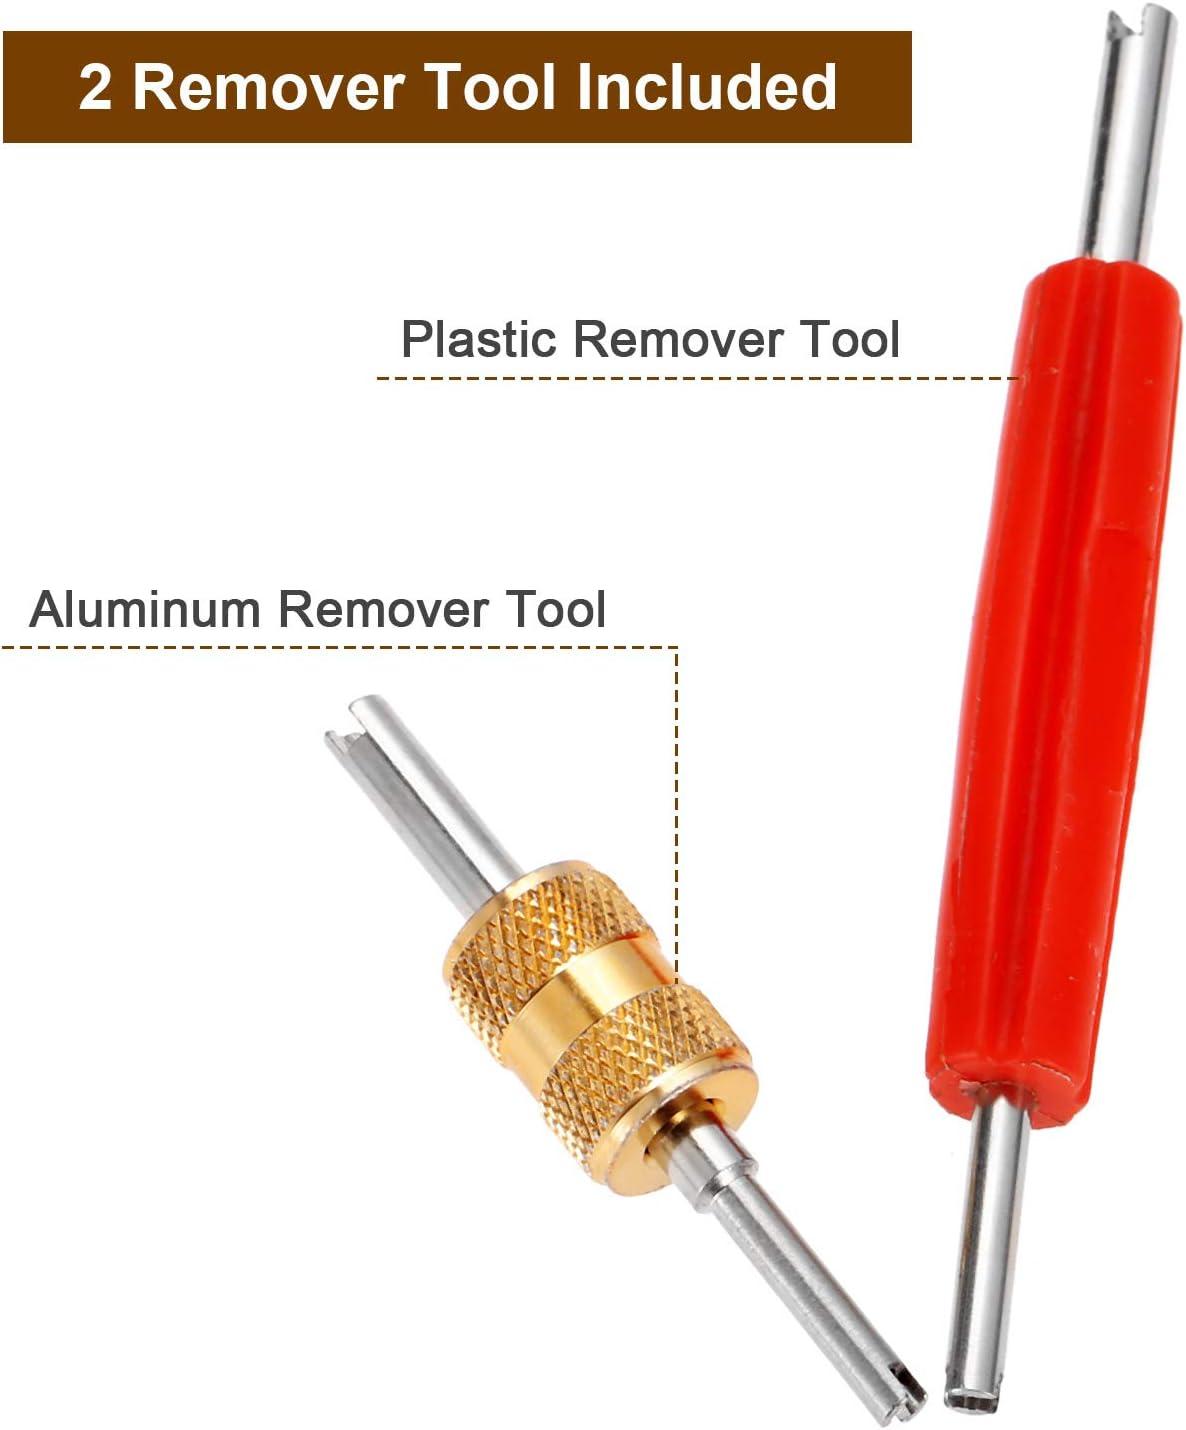 Silver Red Grebest Car Air Conditioning Repair Tool Car Interior Parts Repair Tool 10Pcs//Set Car Air Conditioning Install Repair Tire Valve Core Wrench Remove Tool